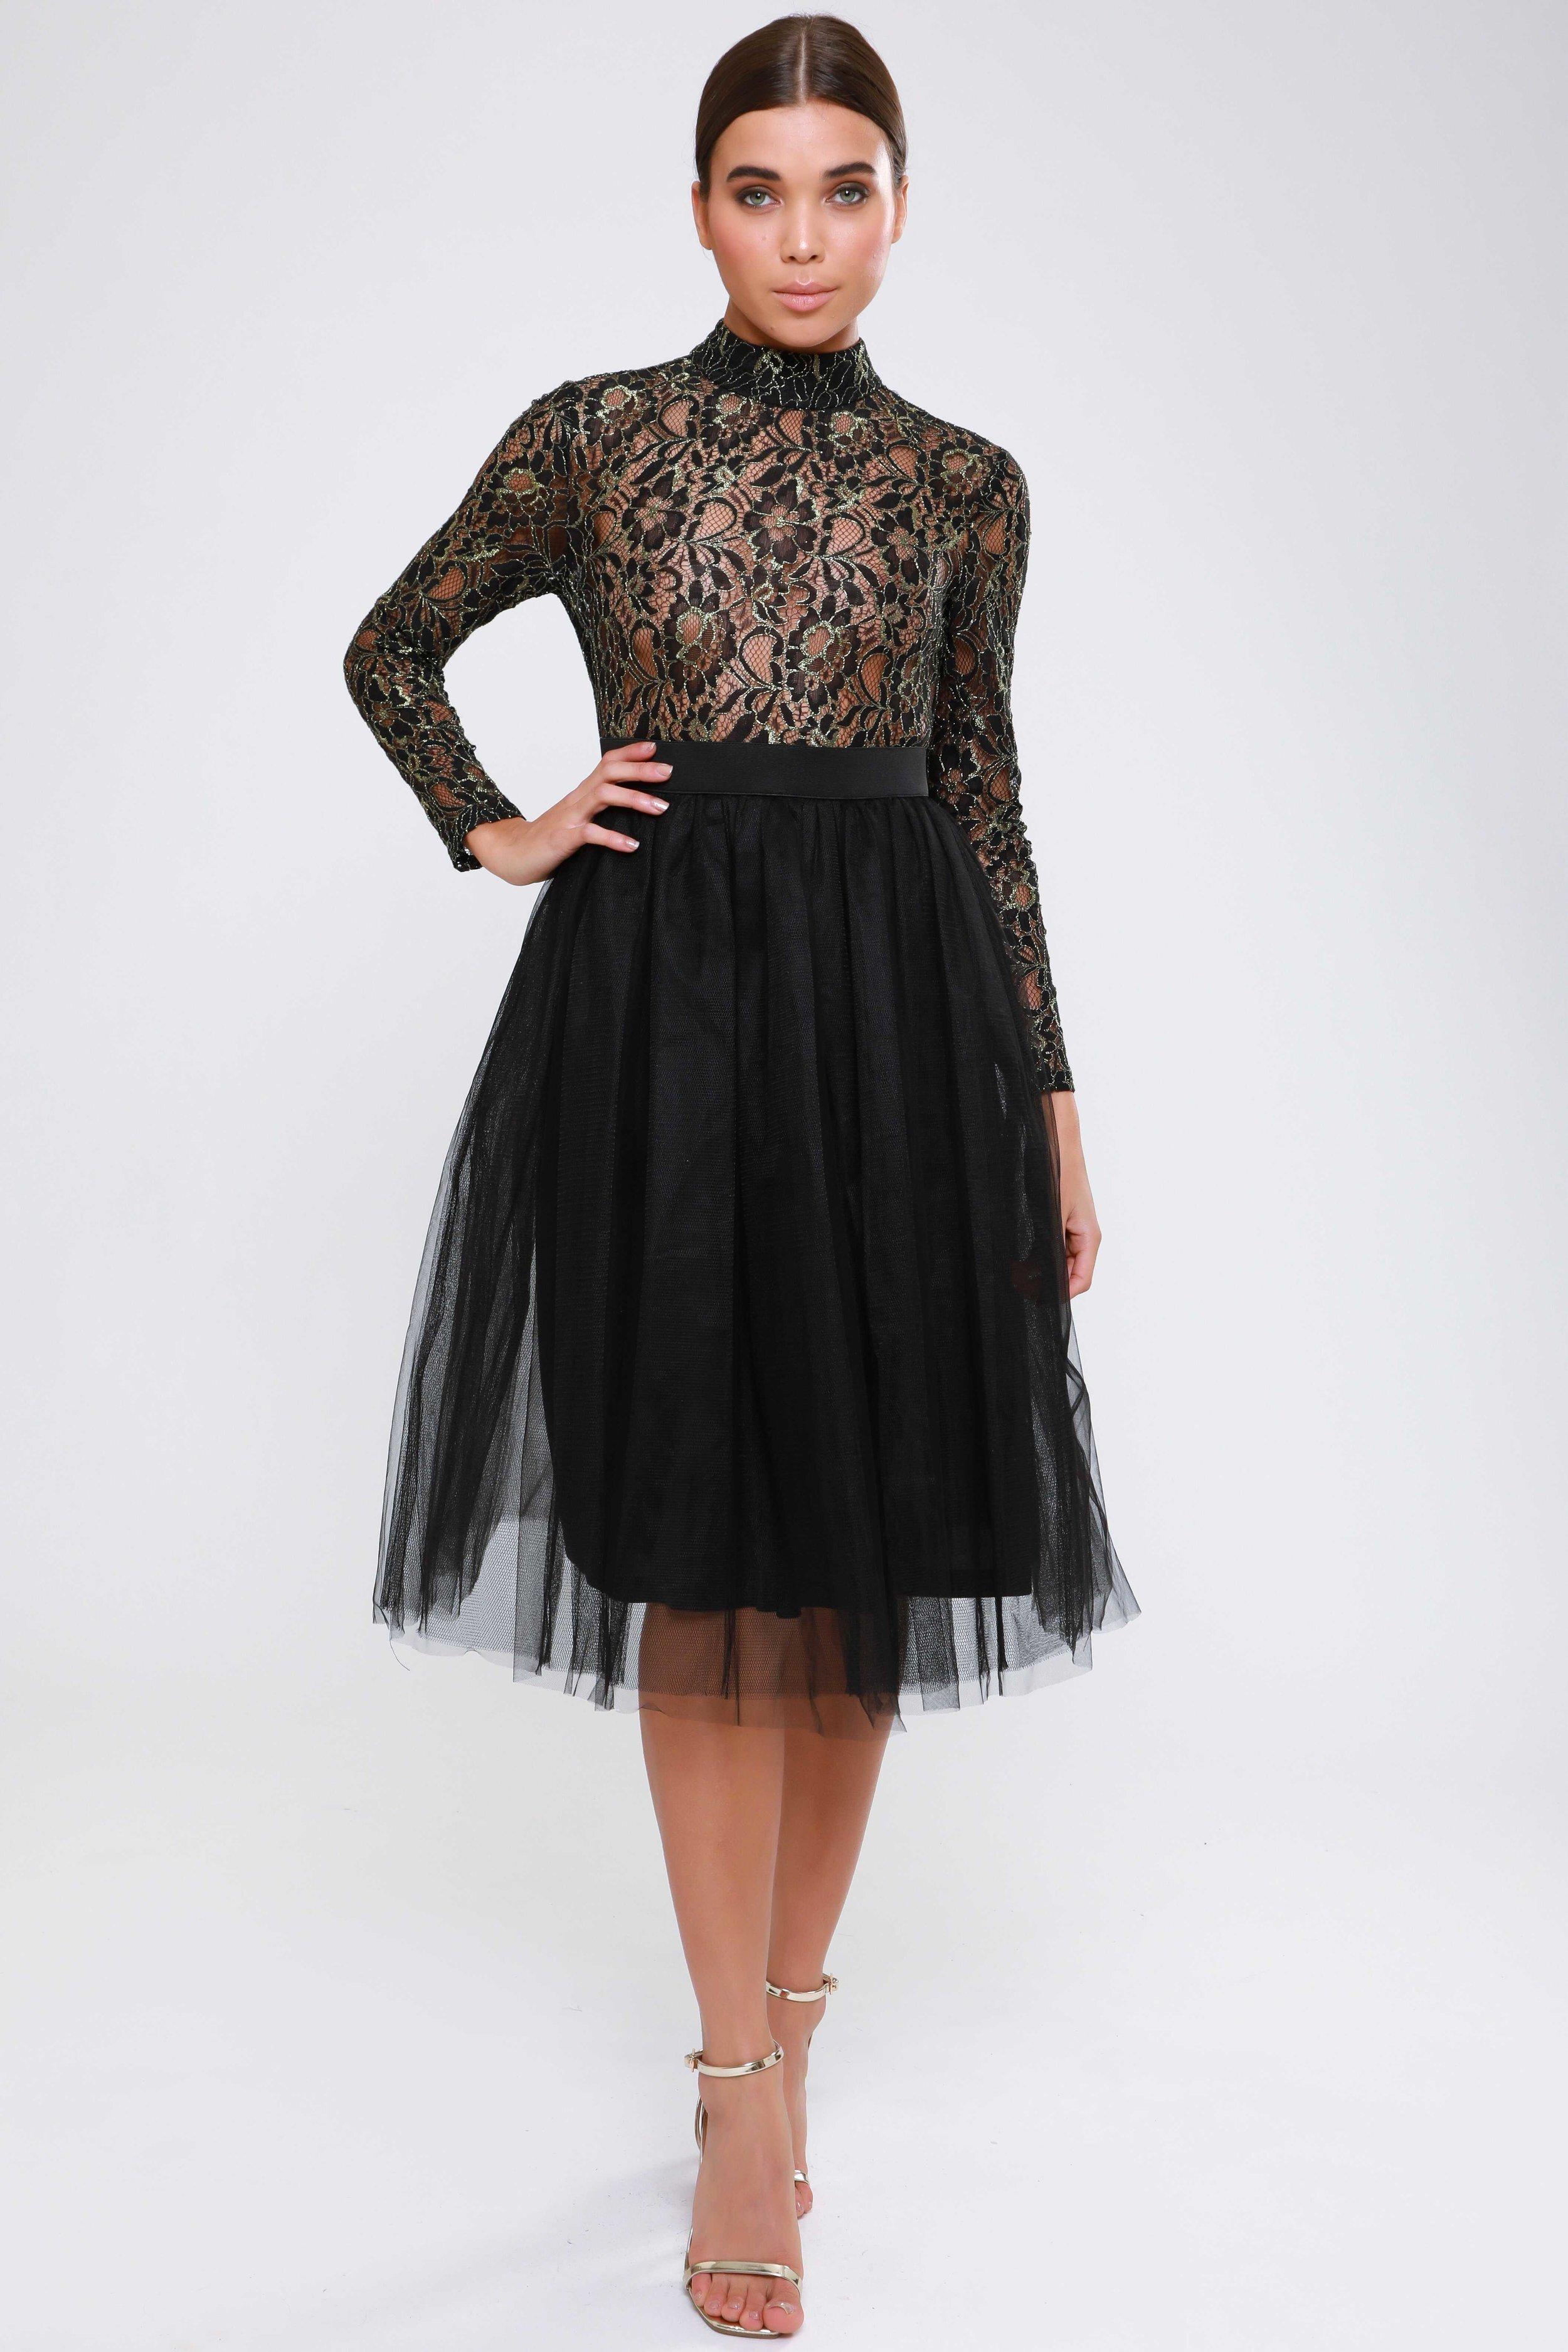 Metallic Lace  Tutu Dress   £75.00